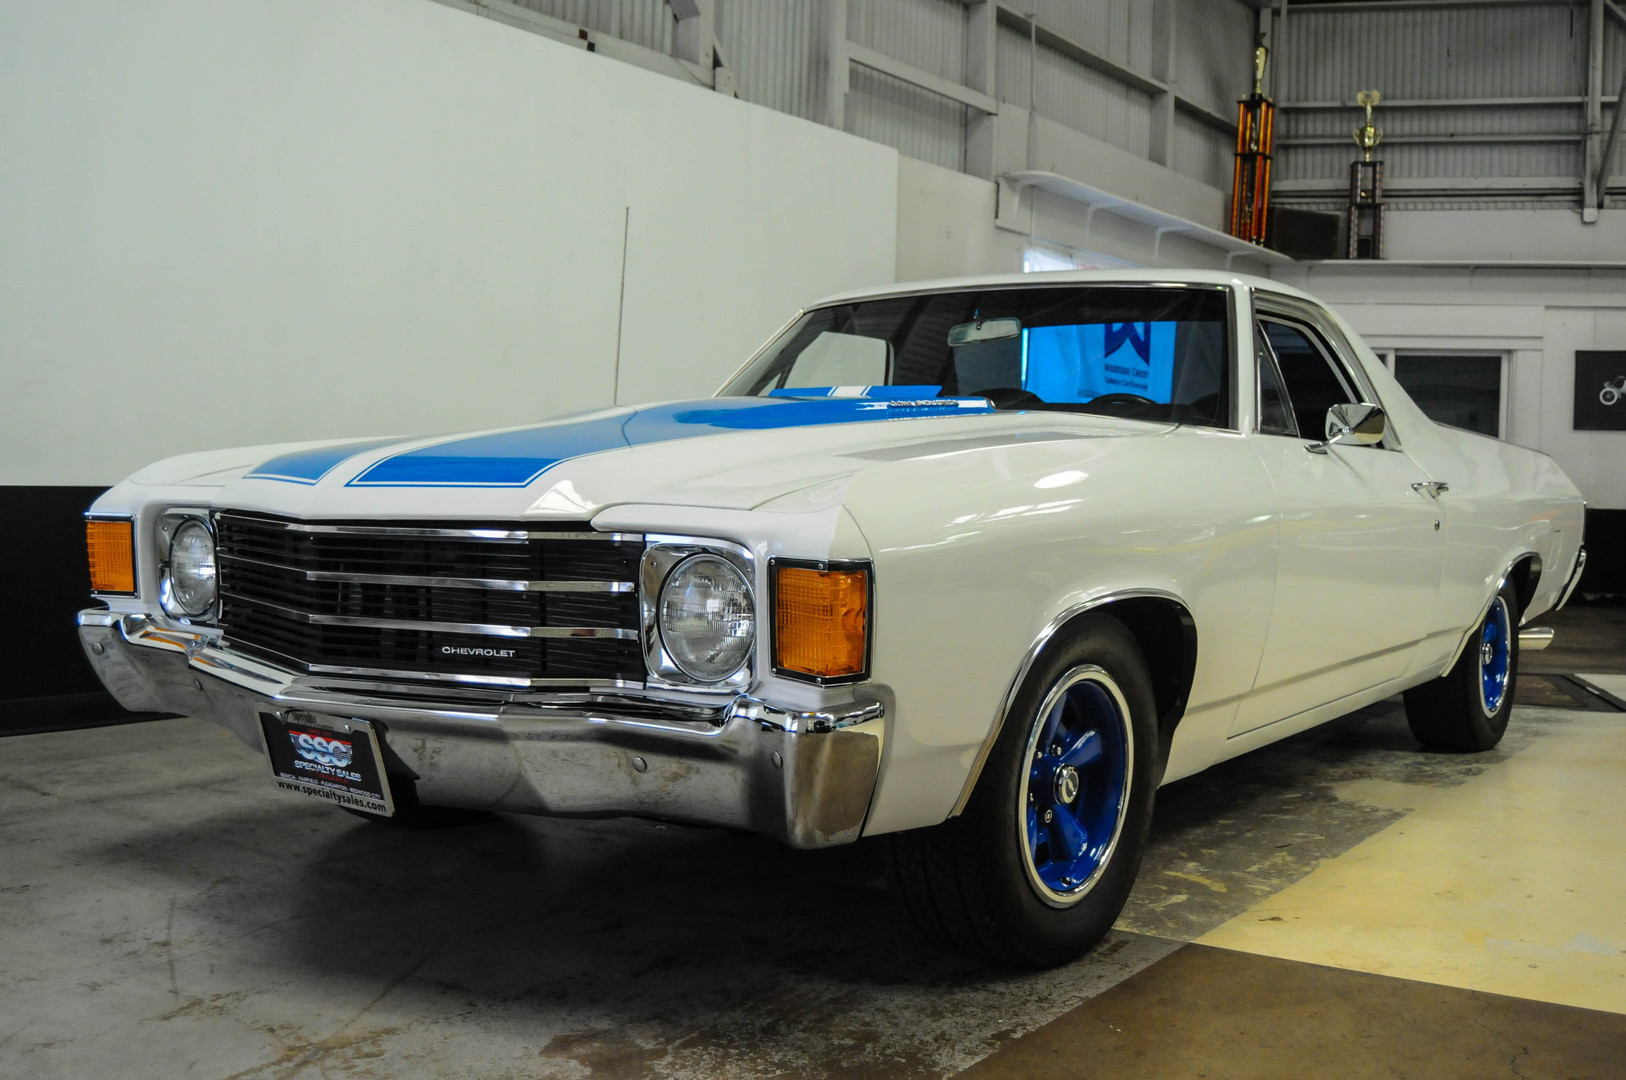 1972 chevrolet el camino 2 door custom pickup sold